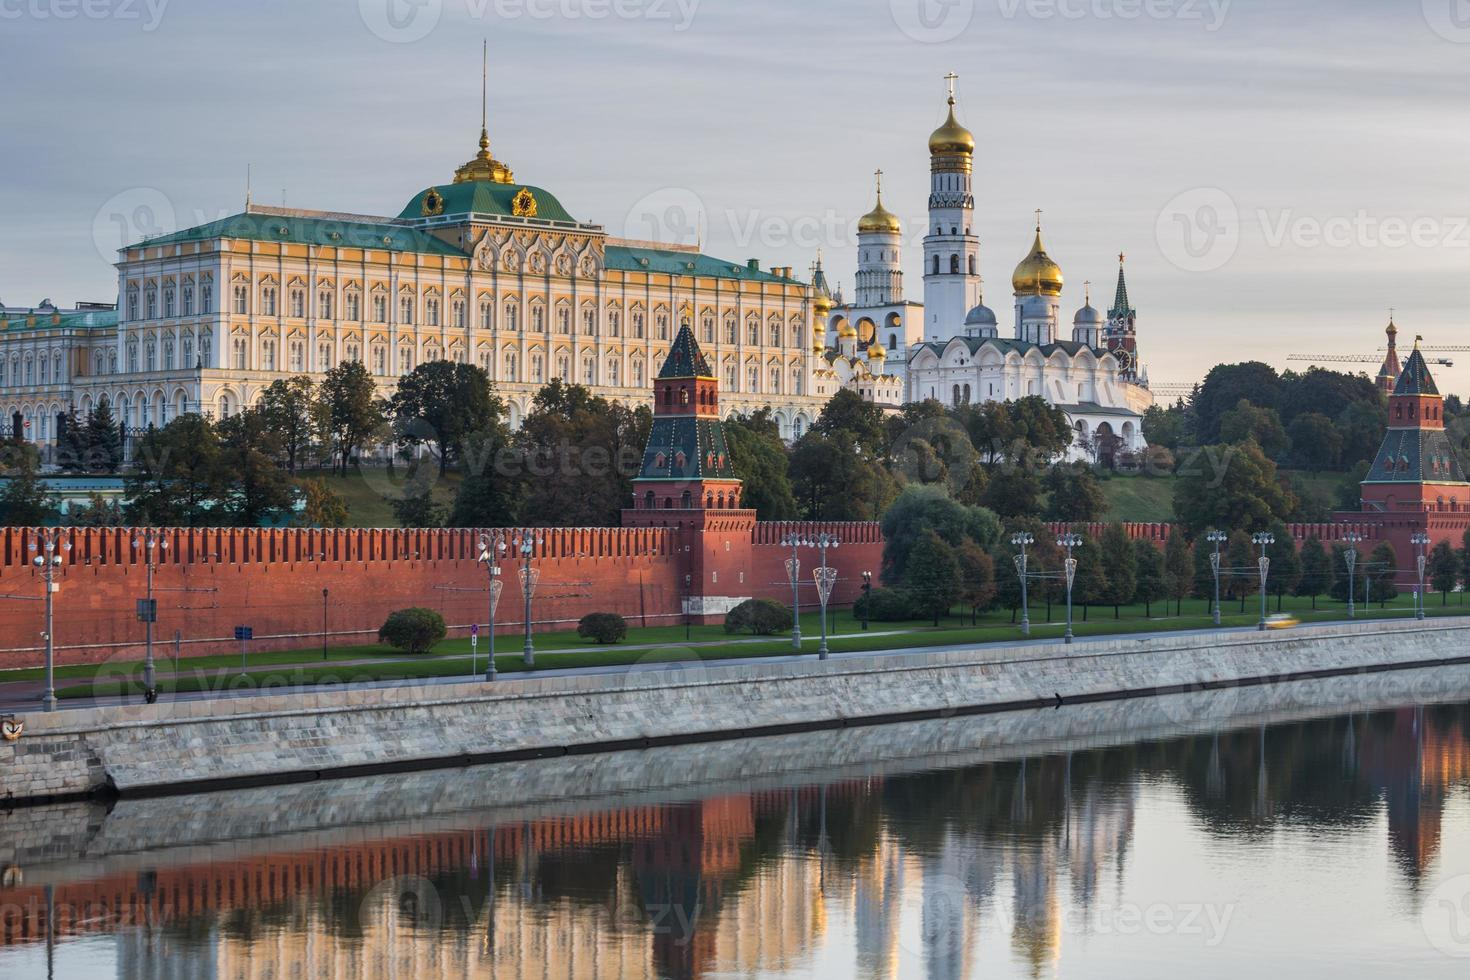 kreml i Moskva, Ryssland foto